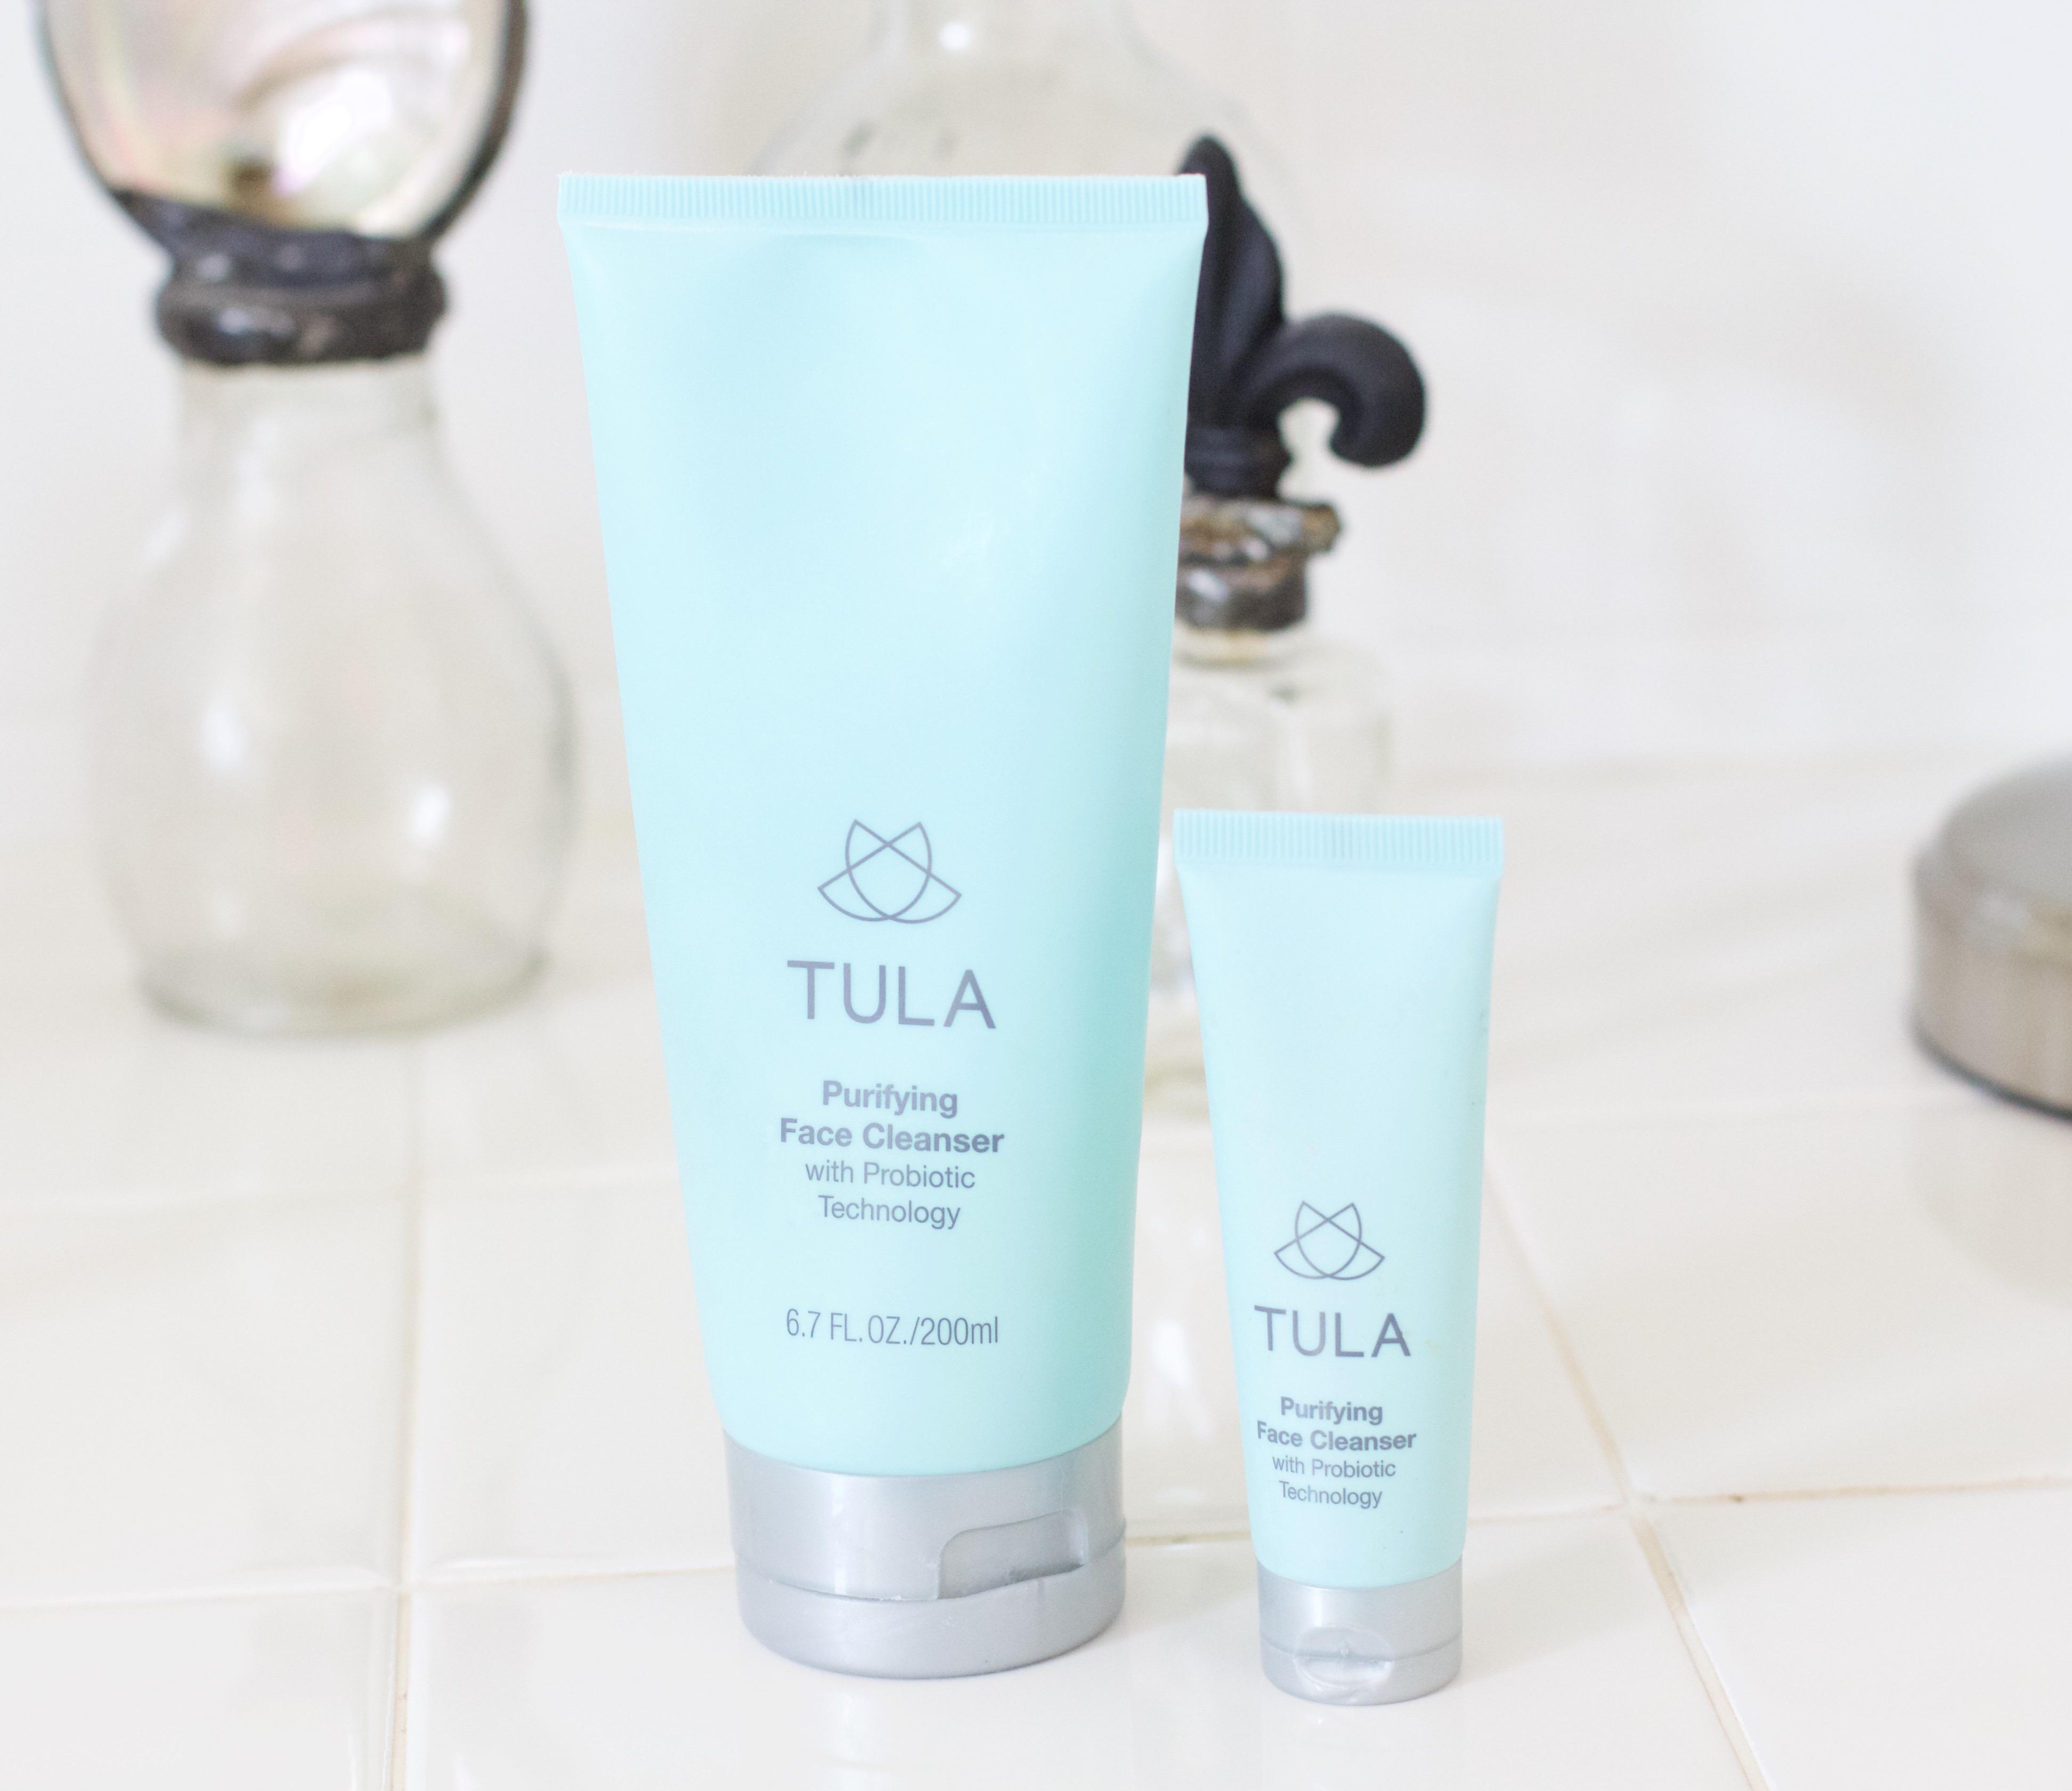 tula skin care products